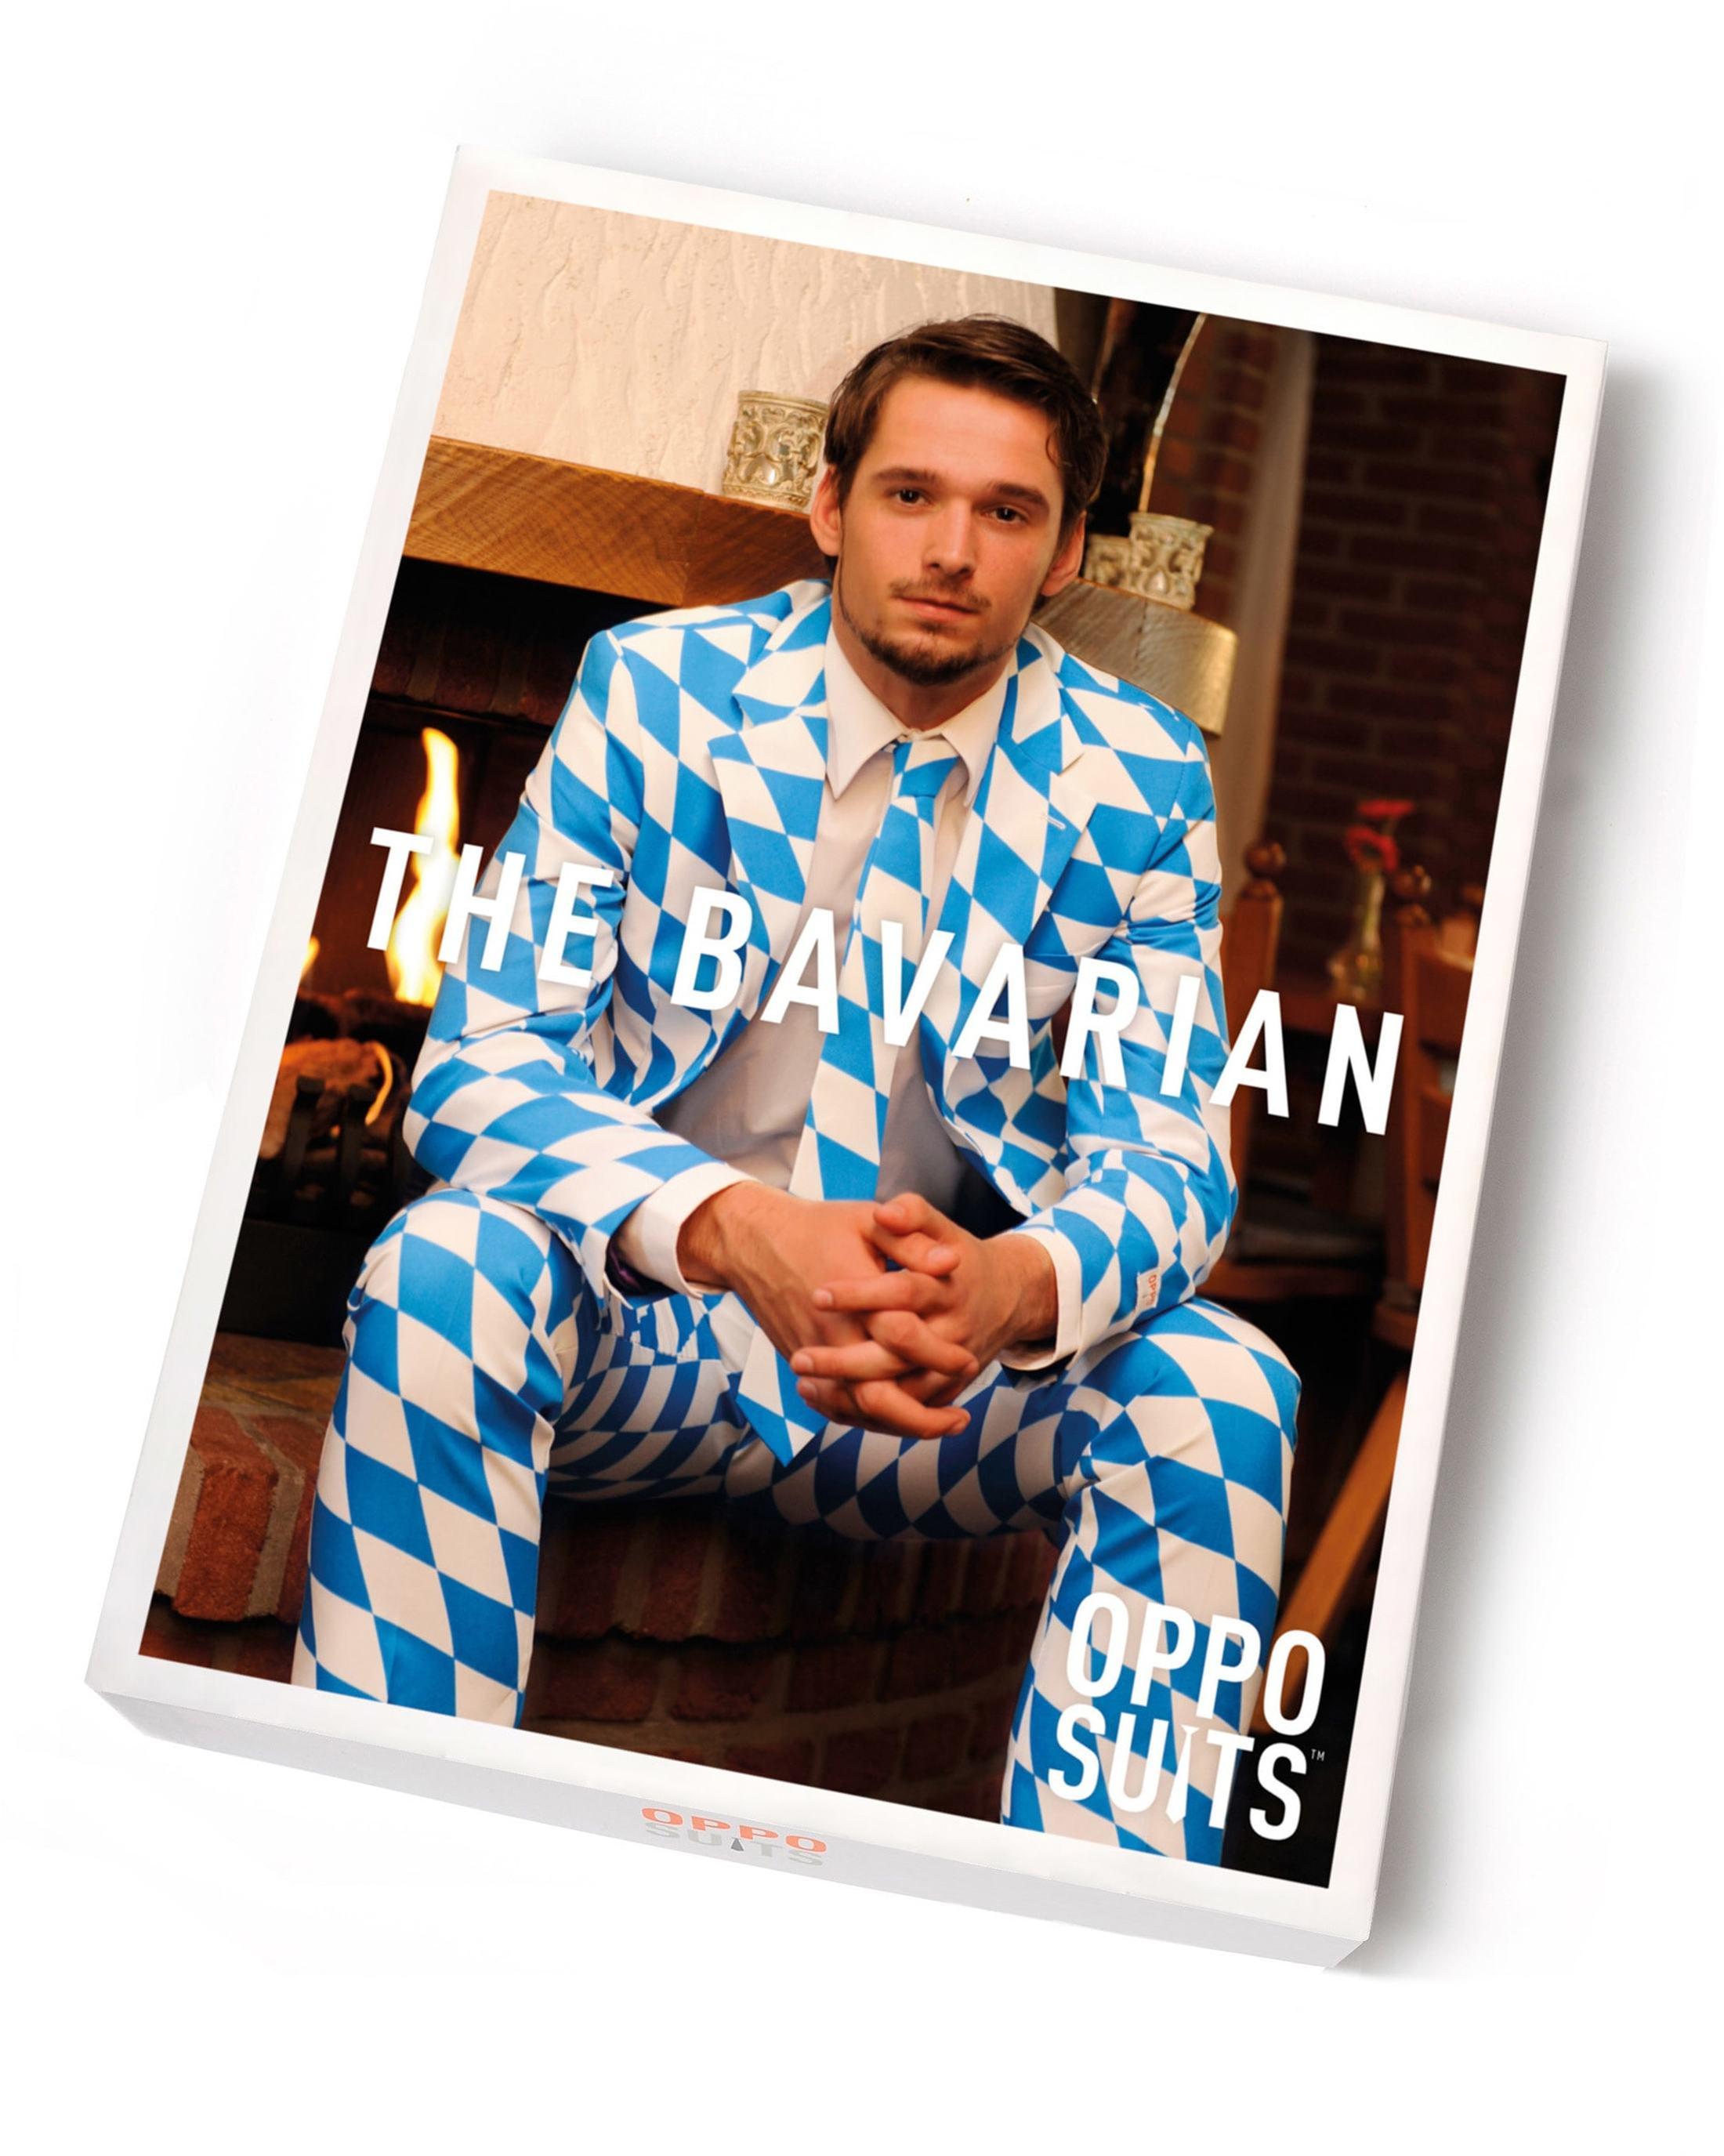 OppoSuits The Bavarian Kostuum foto 5